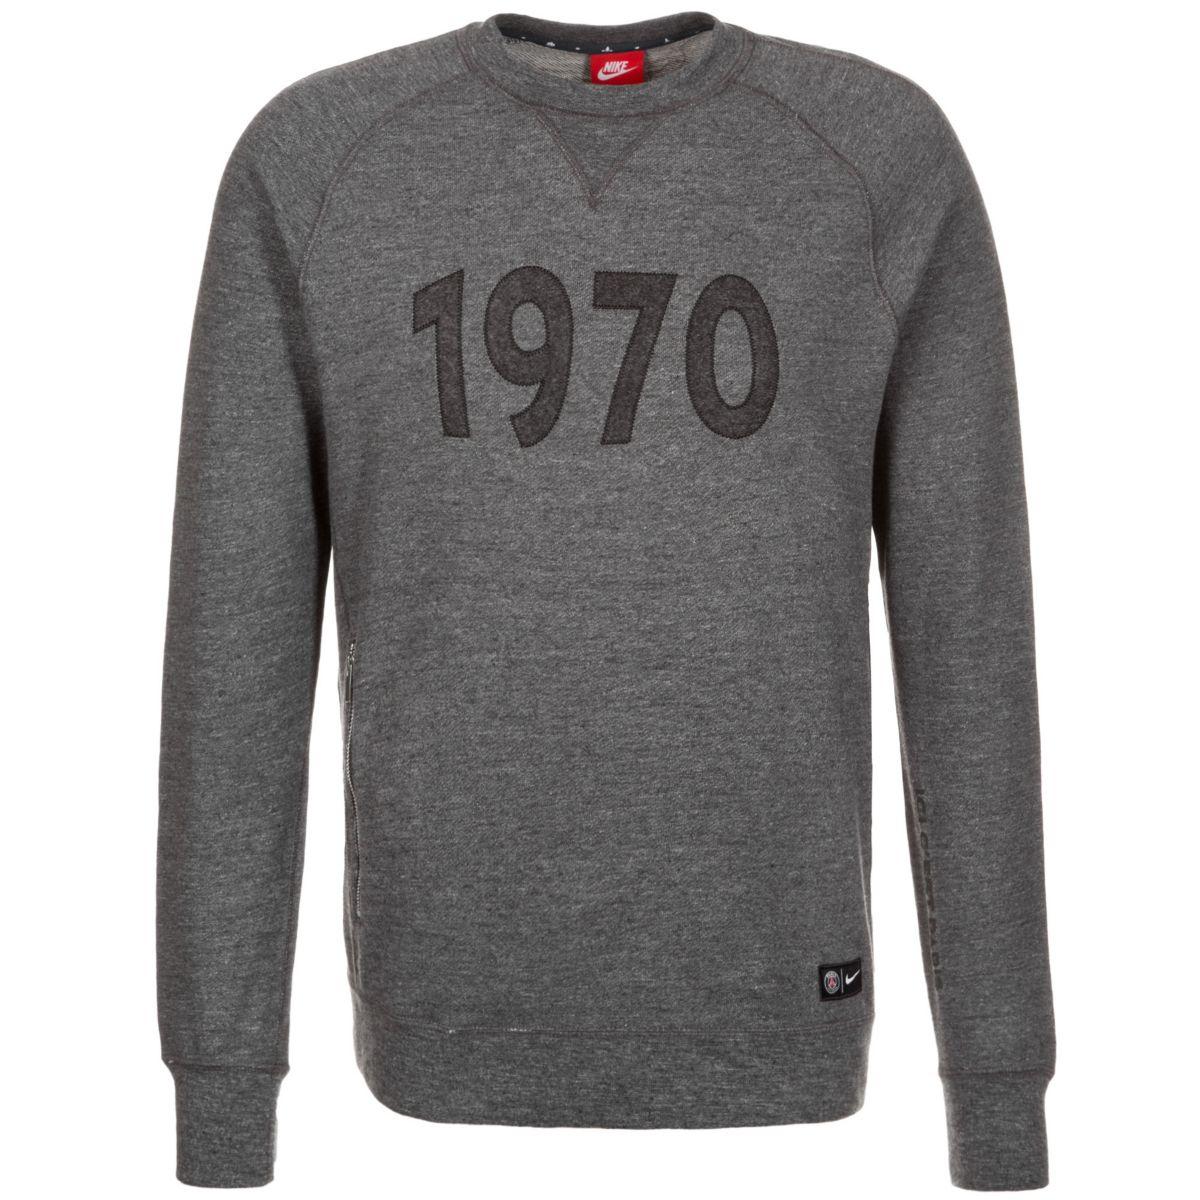 NIKE Paris St.-Germain Crew Authentic Sweatshir...